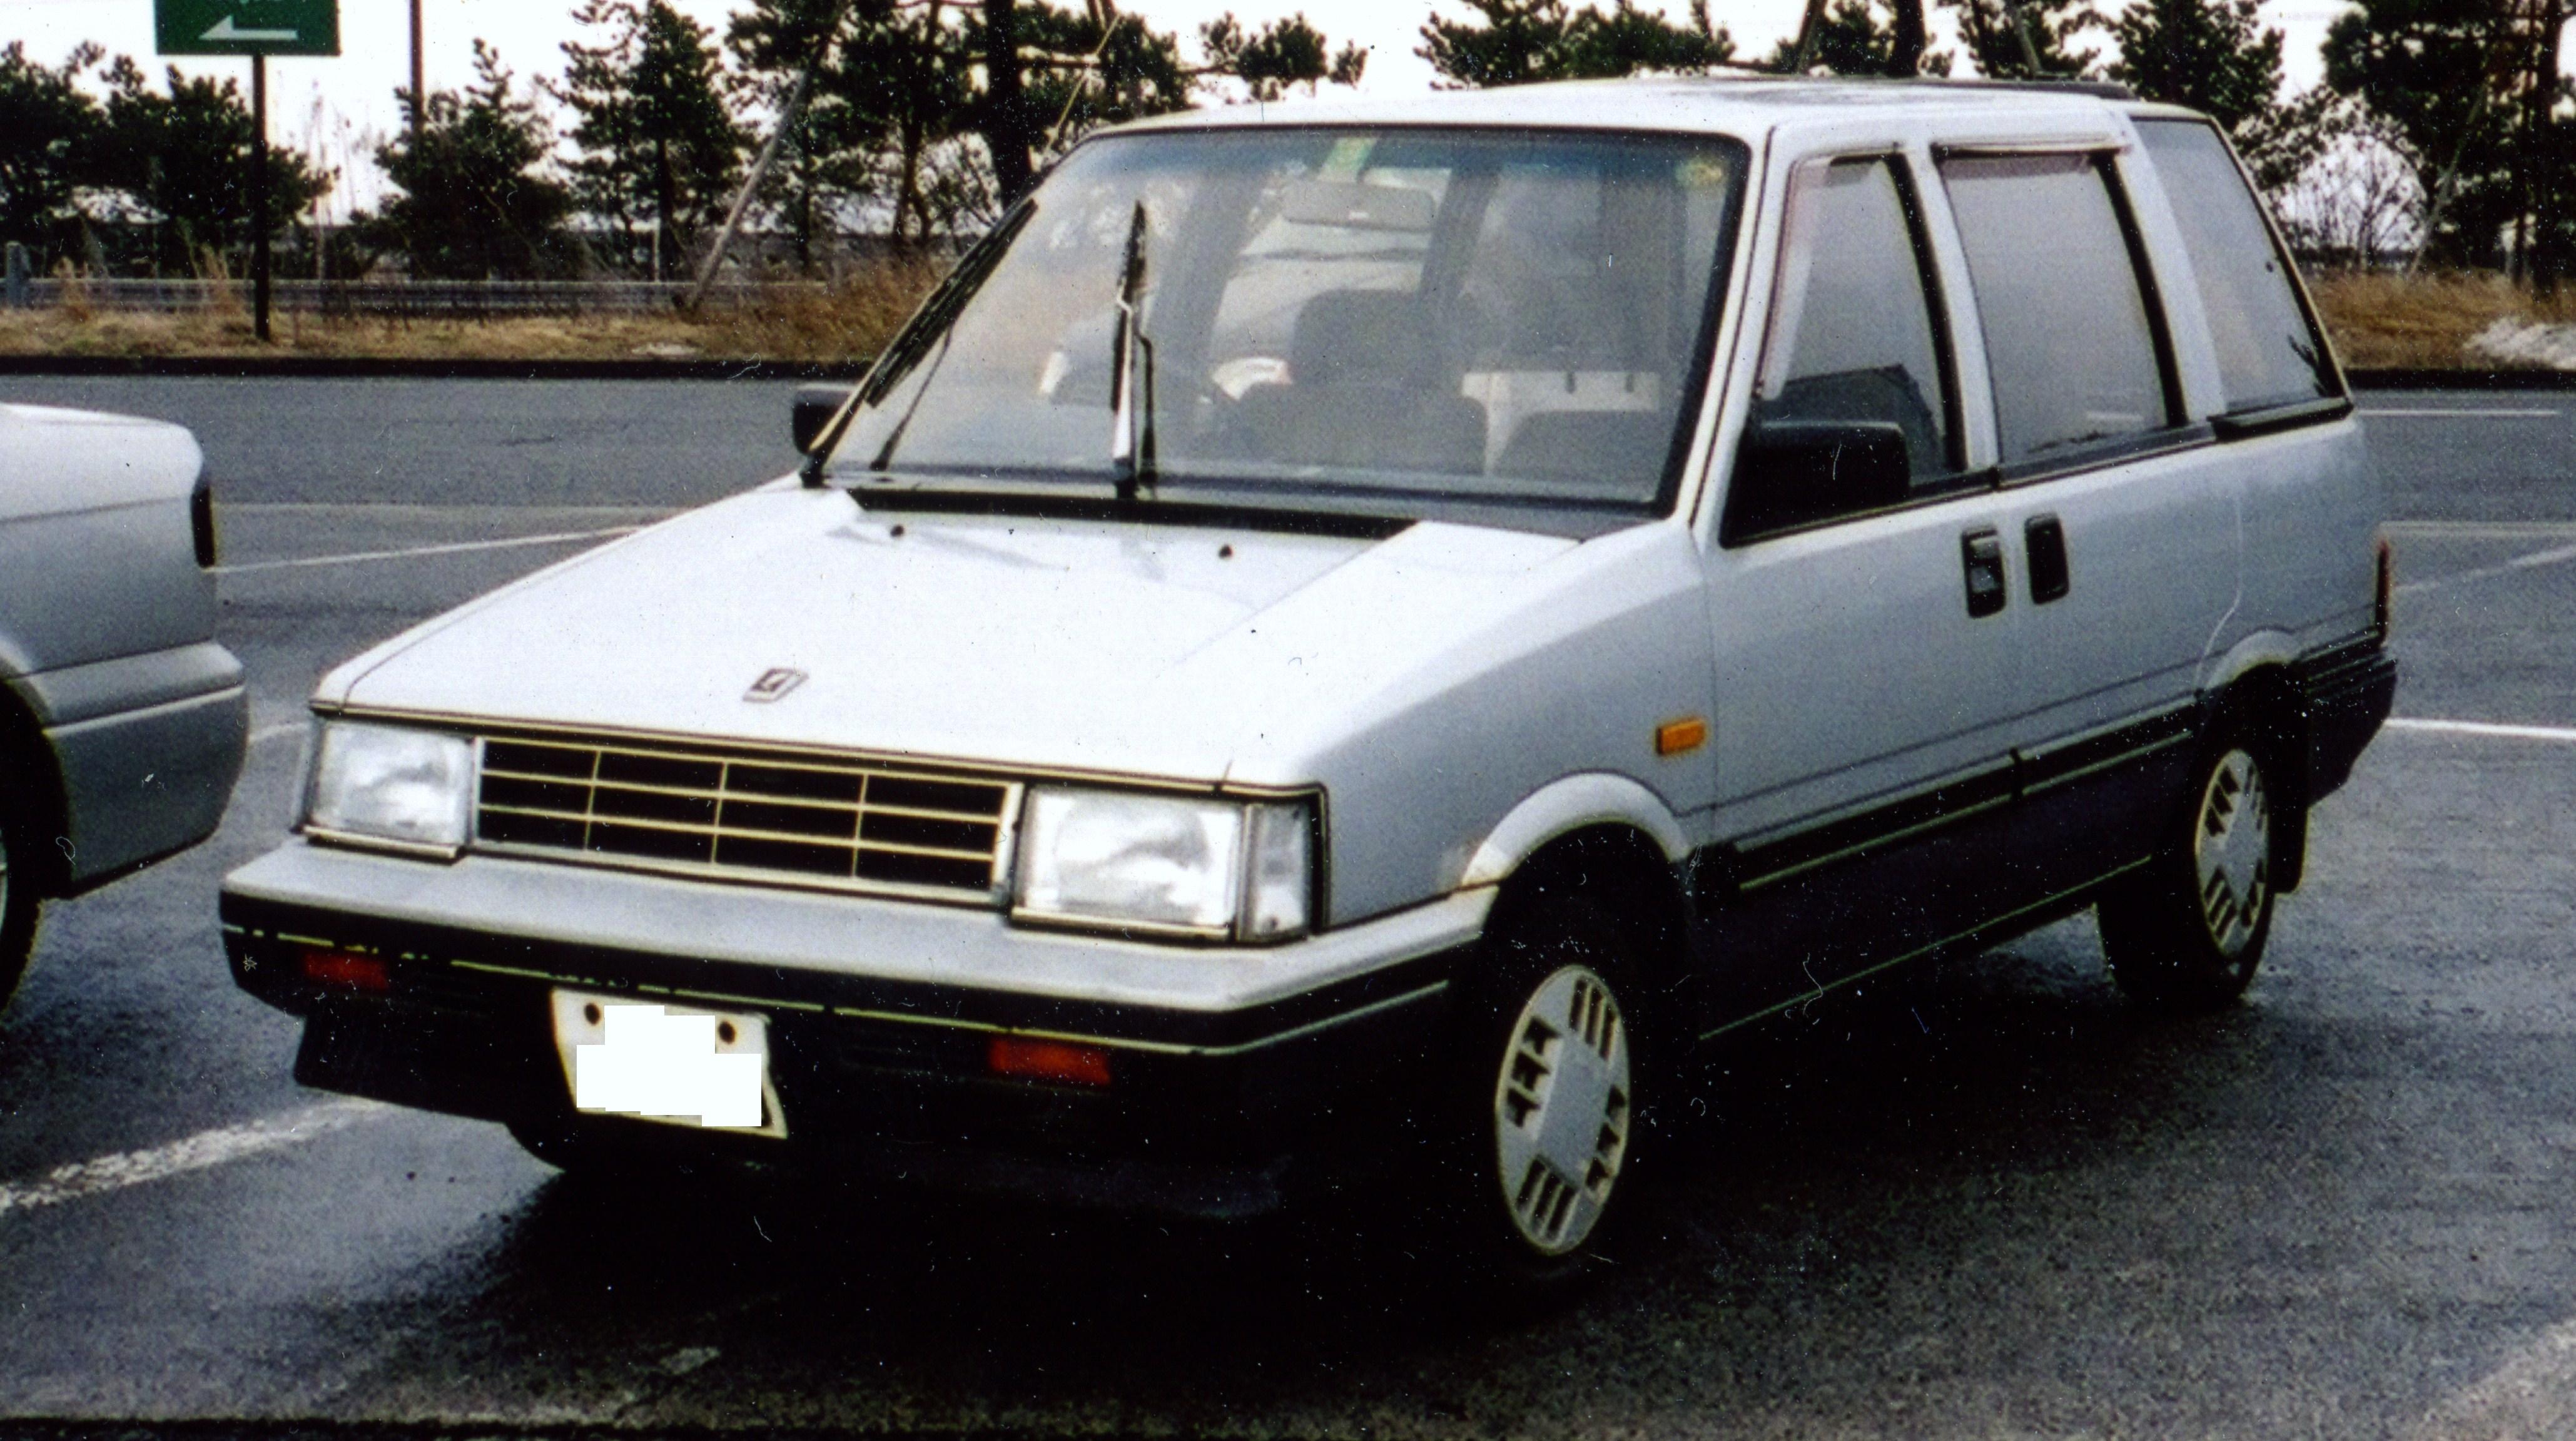 Nissan Prairie I (M10) 1982 - 1988 Compact MPV #5